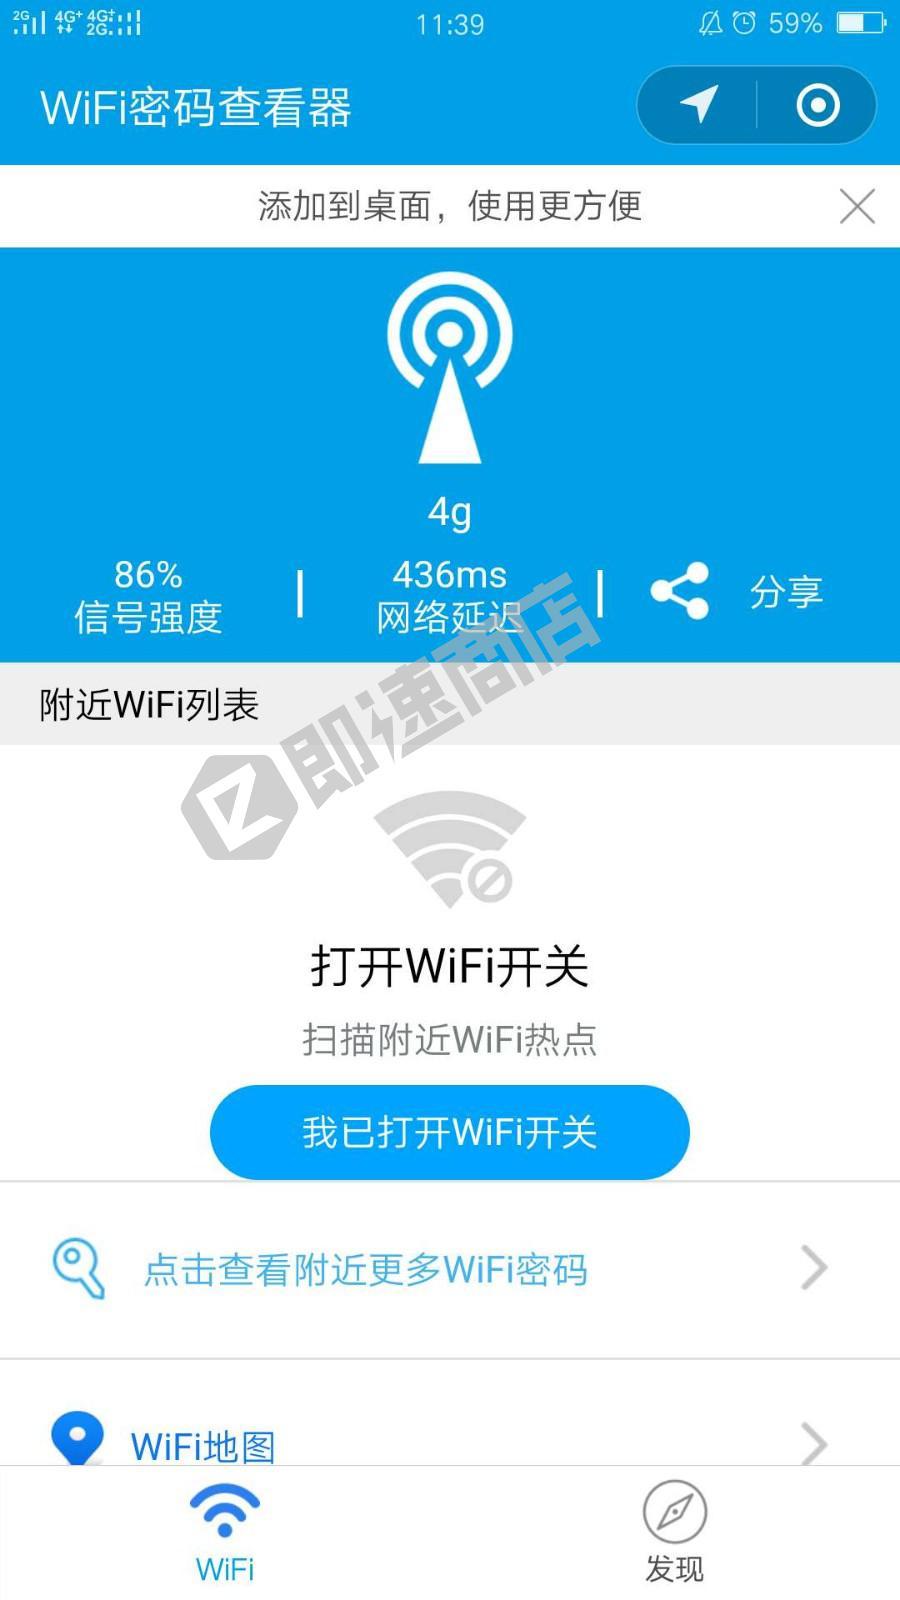 wifi密码查看器官方版小程序首页截图